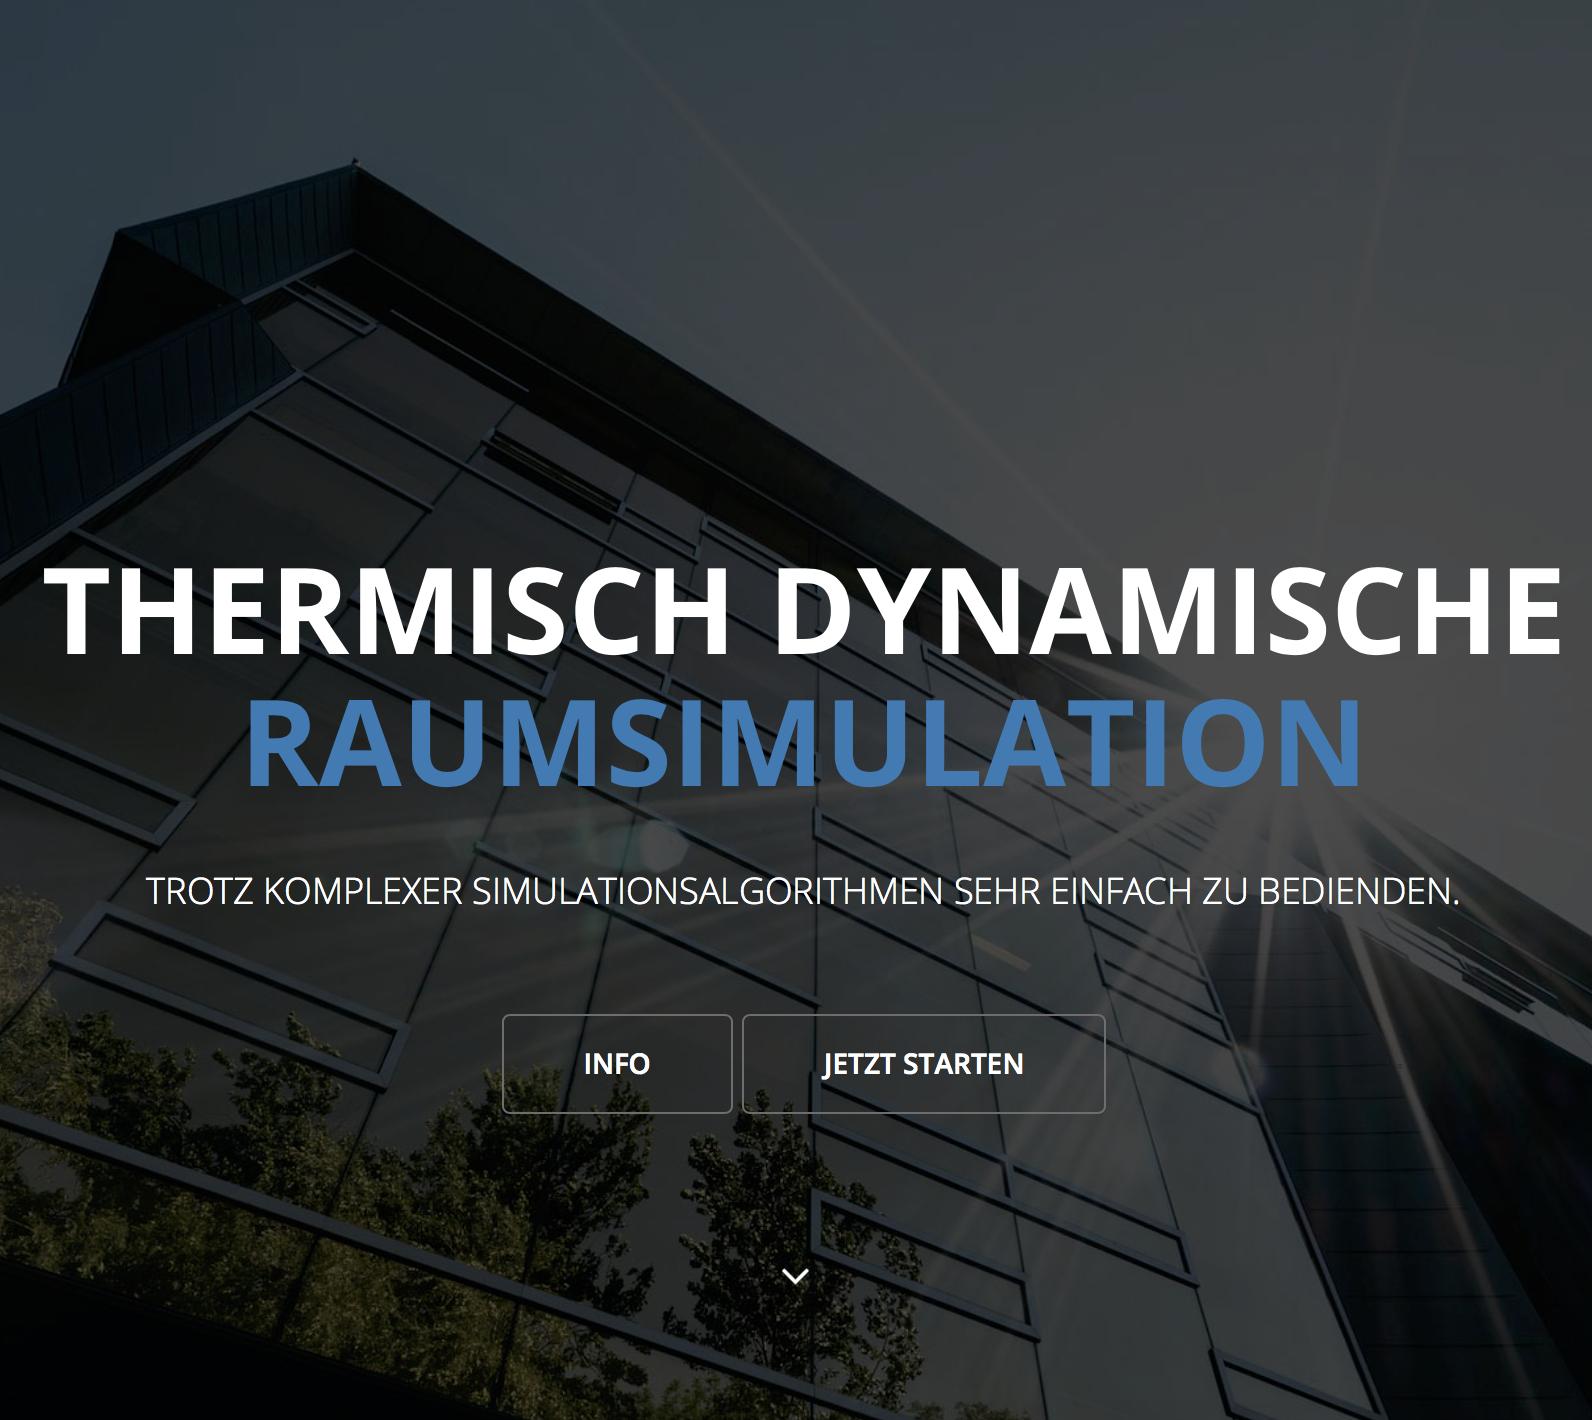 """TheSim3D"" - GRATIS Simulationstool zur Berechnung der operativen Raum-Temperatur"